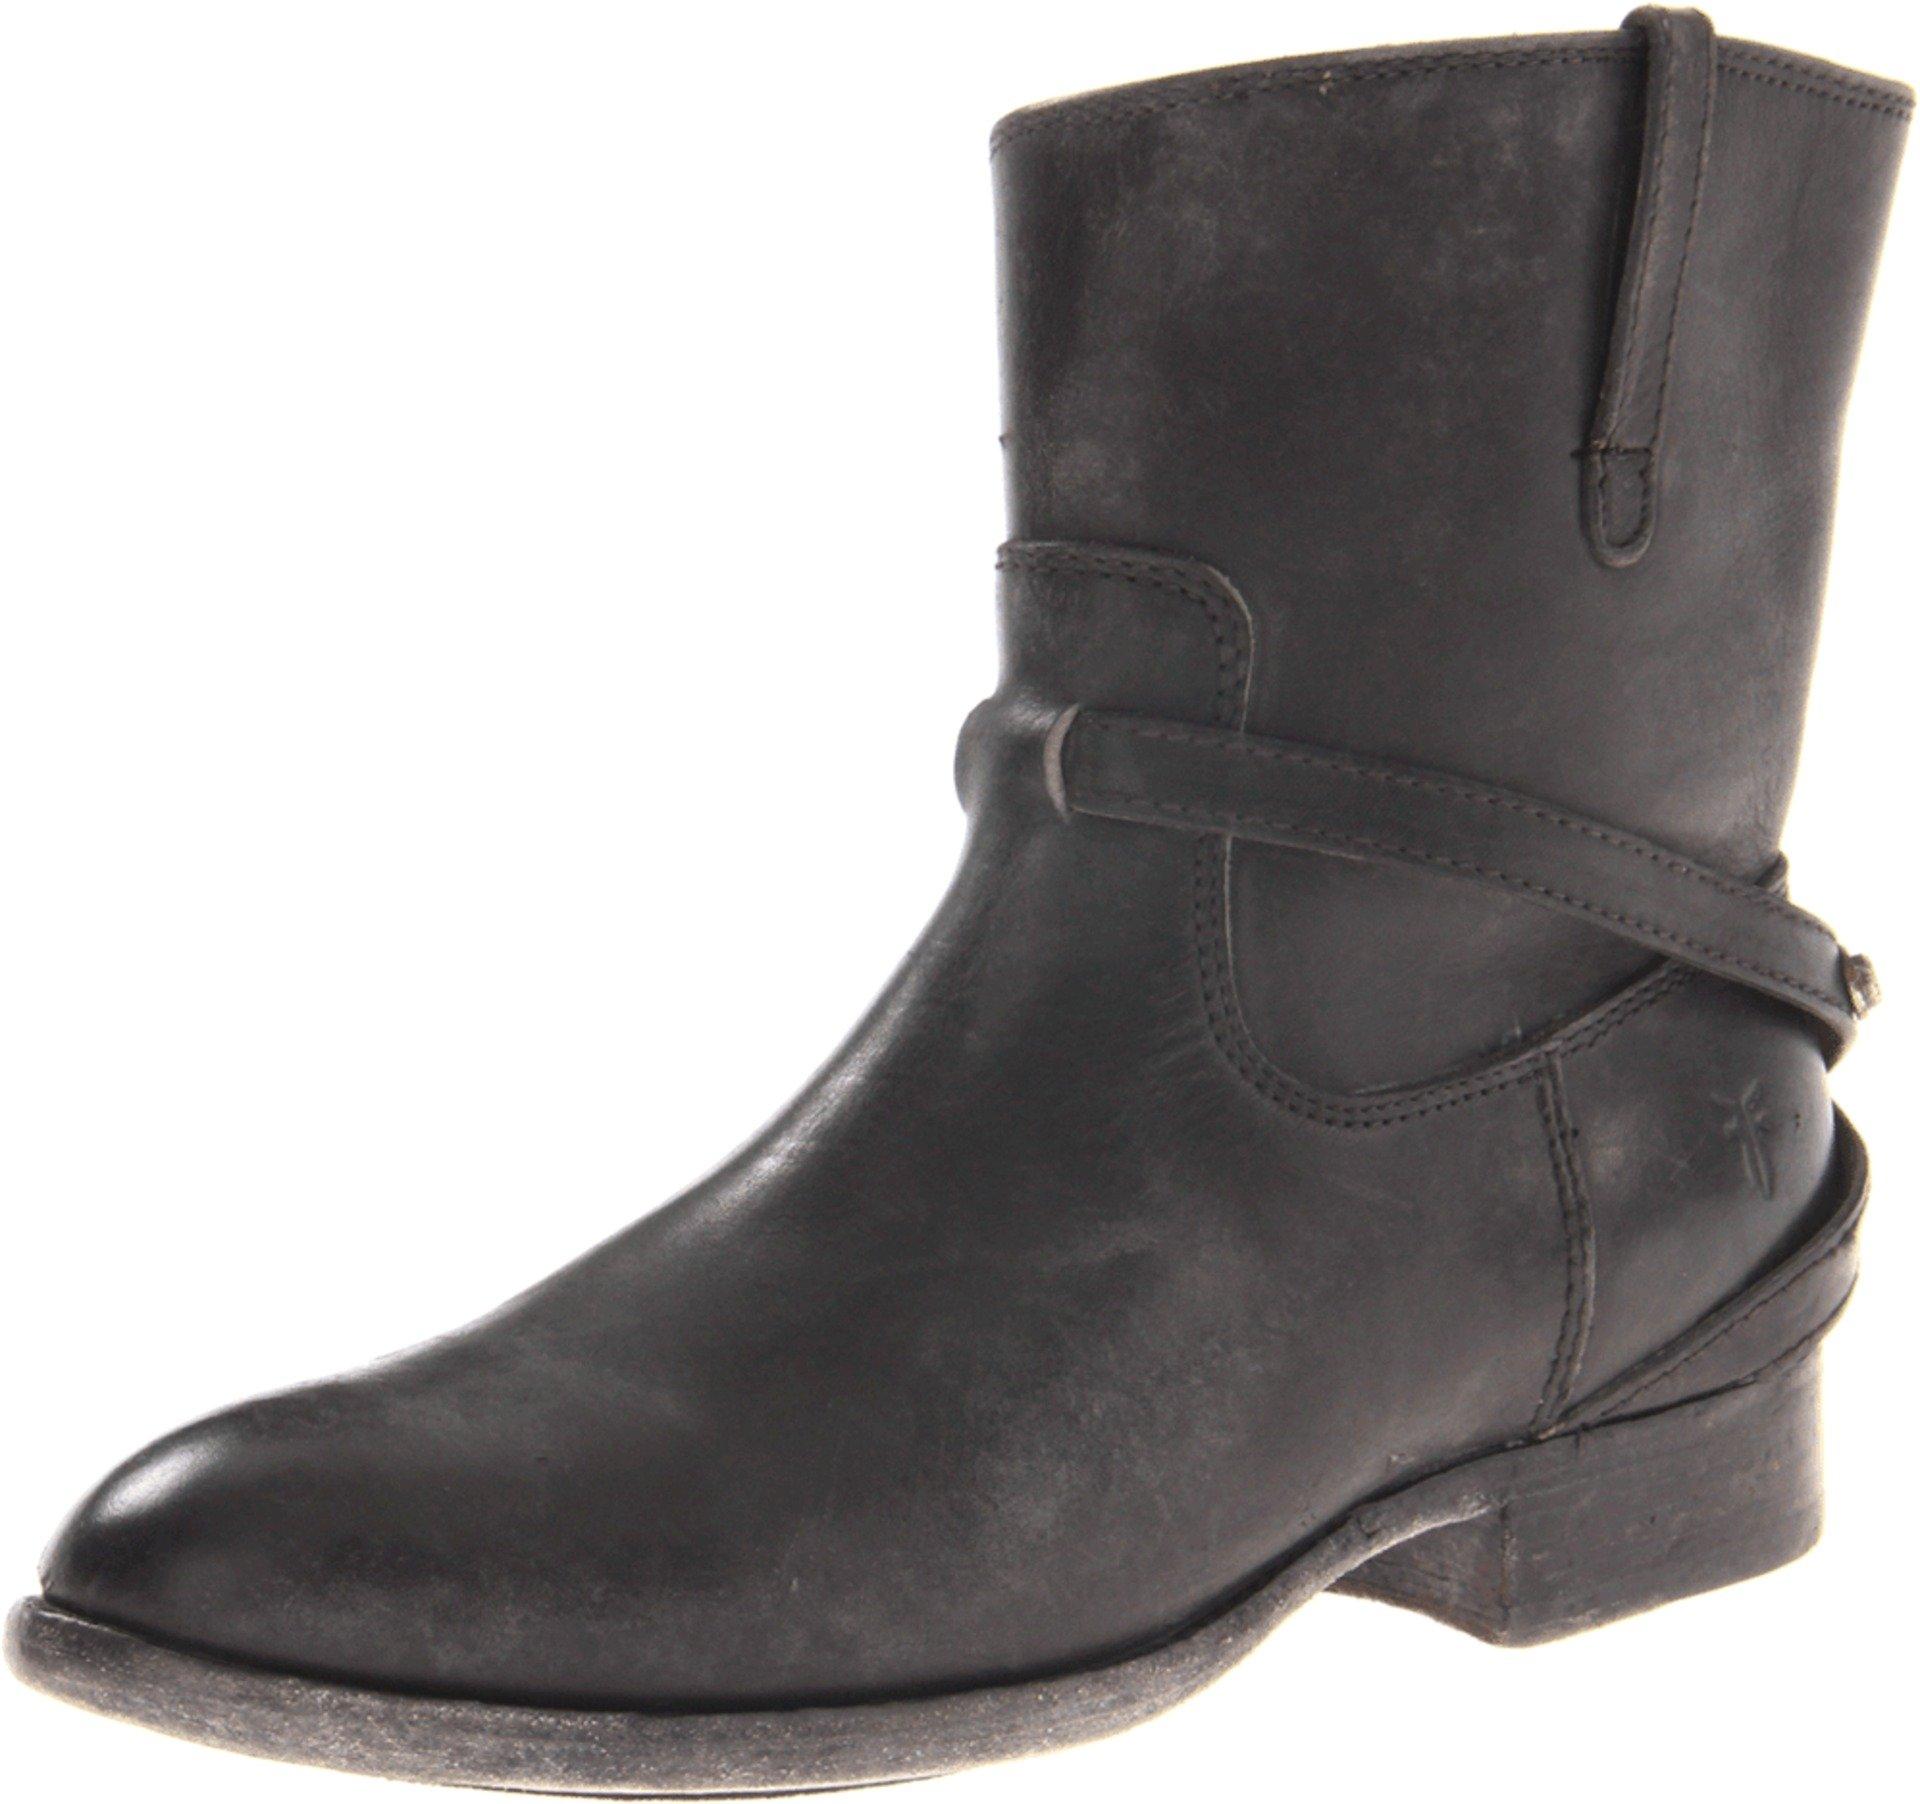 FRYE Women's Lindsay Plate Short Boot, Black Stone Antiqued, 7.5 M US